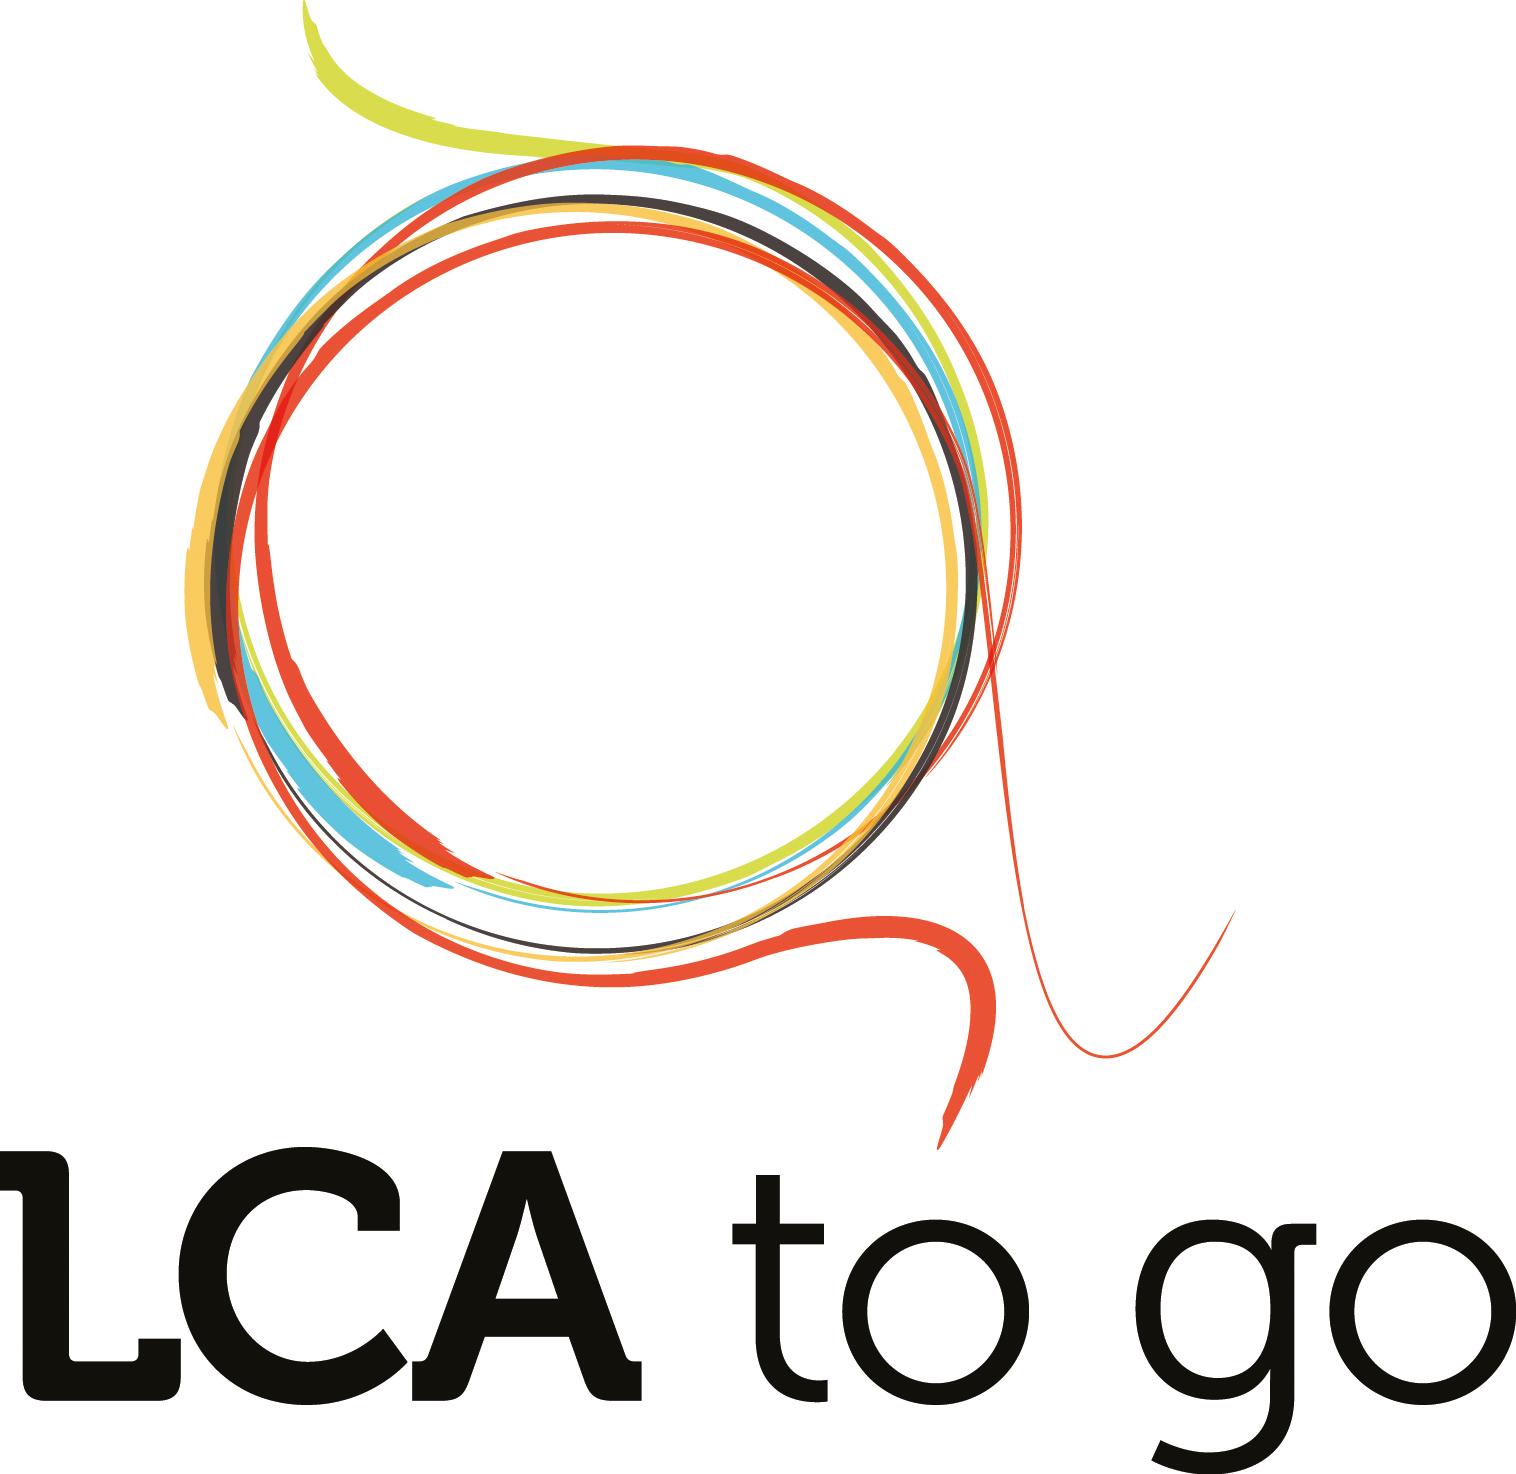 LCAtogo logo